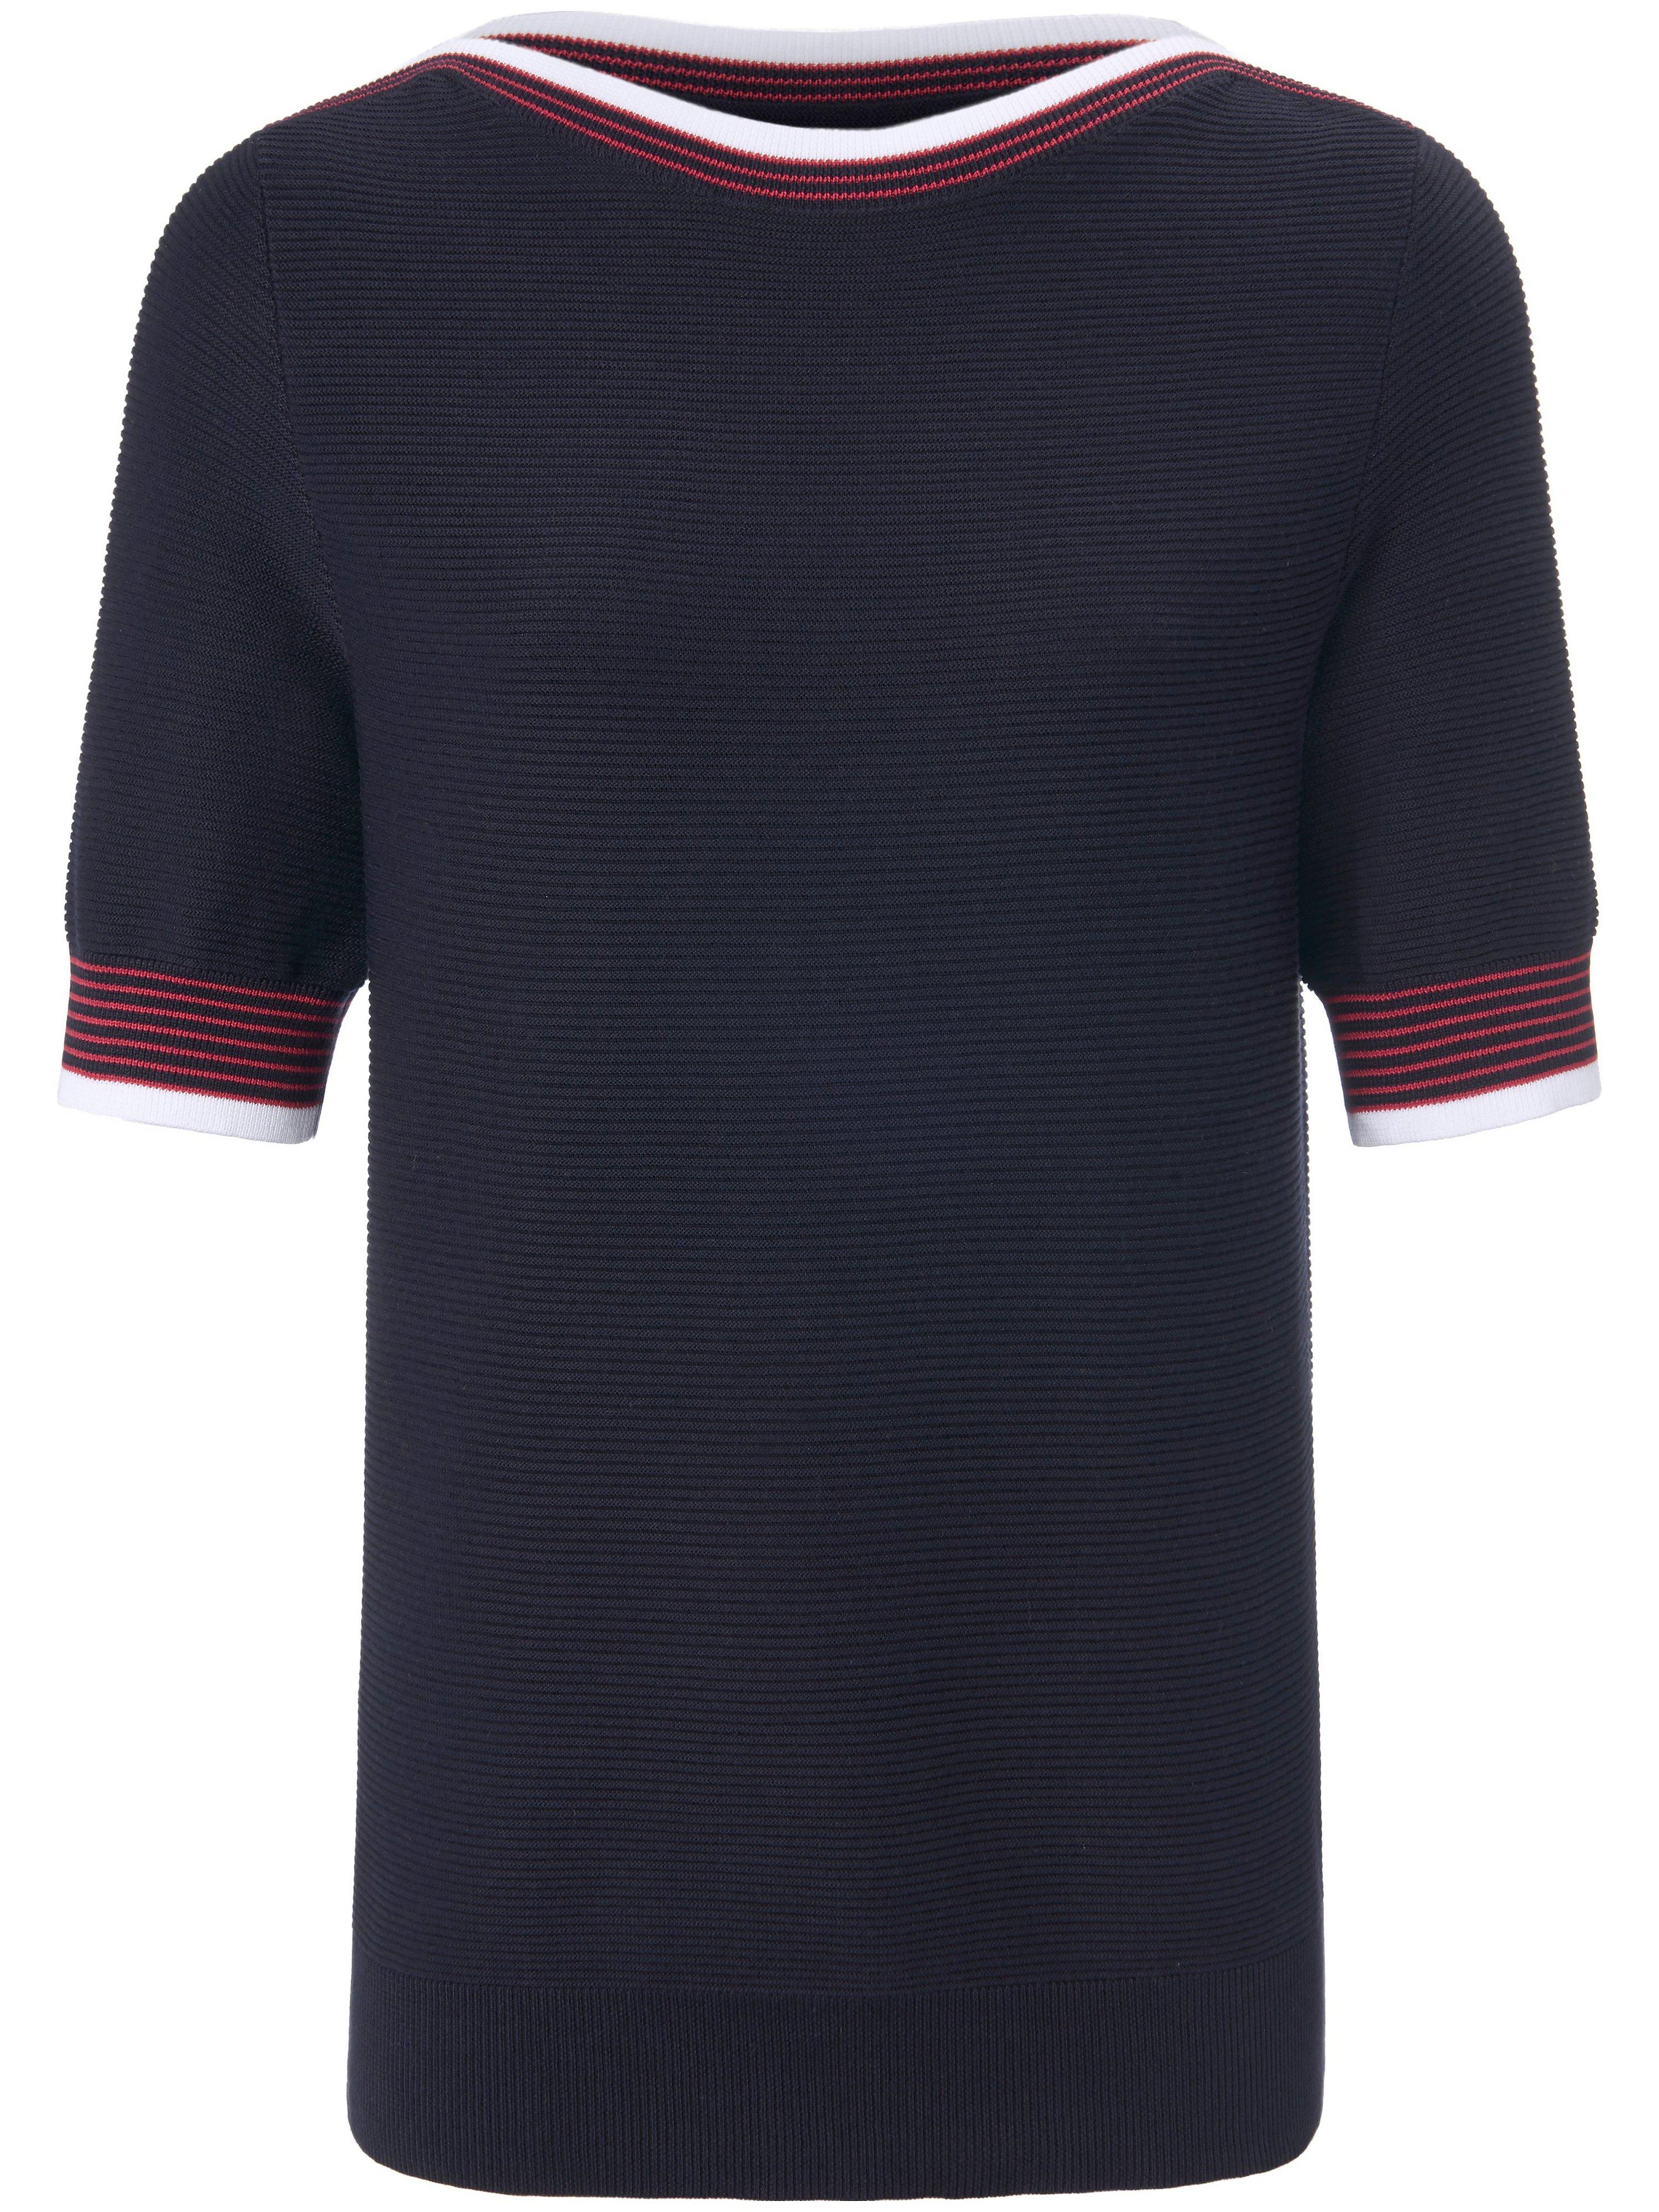 Jumper in 100% cotton Peter Hahn blue